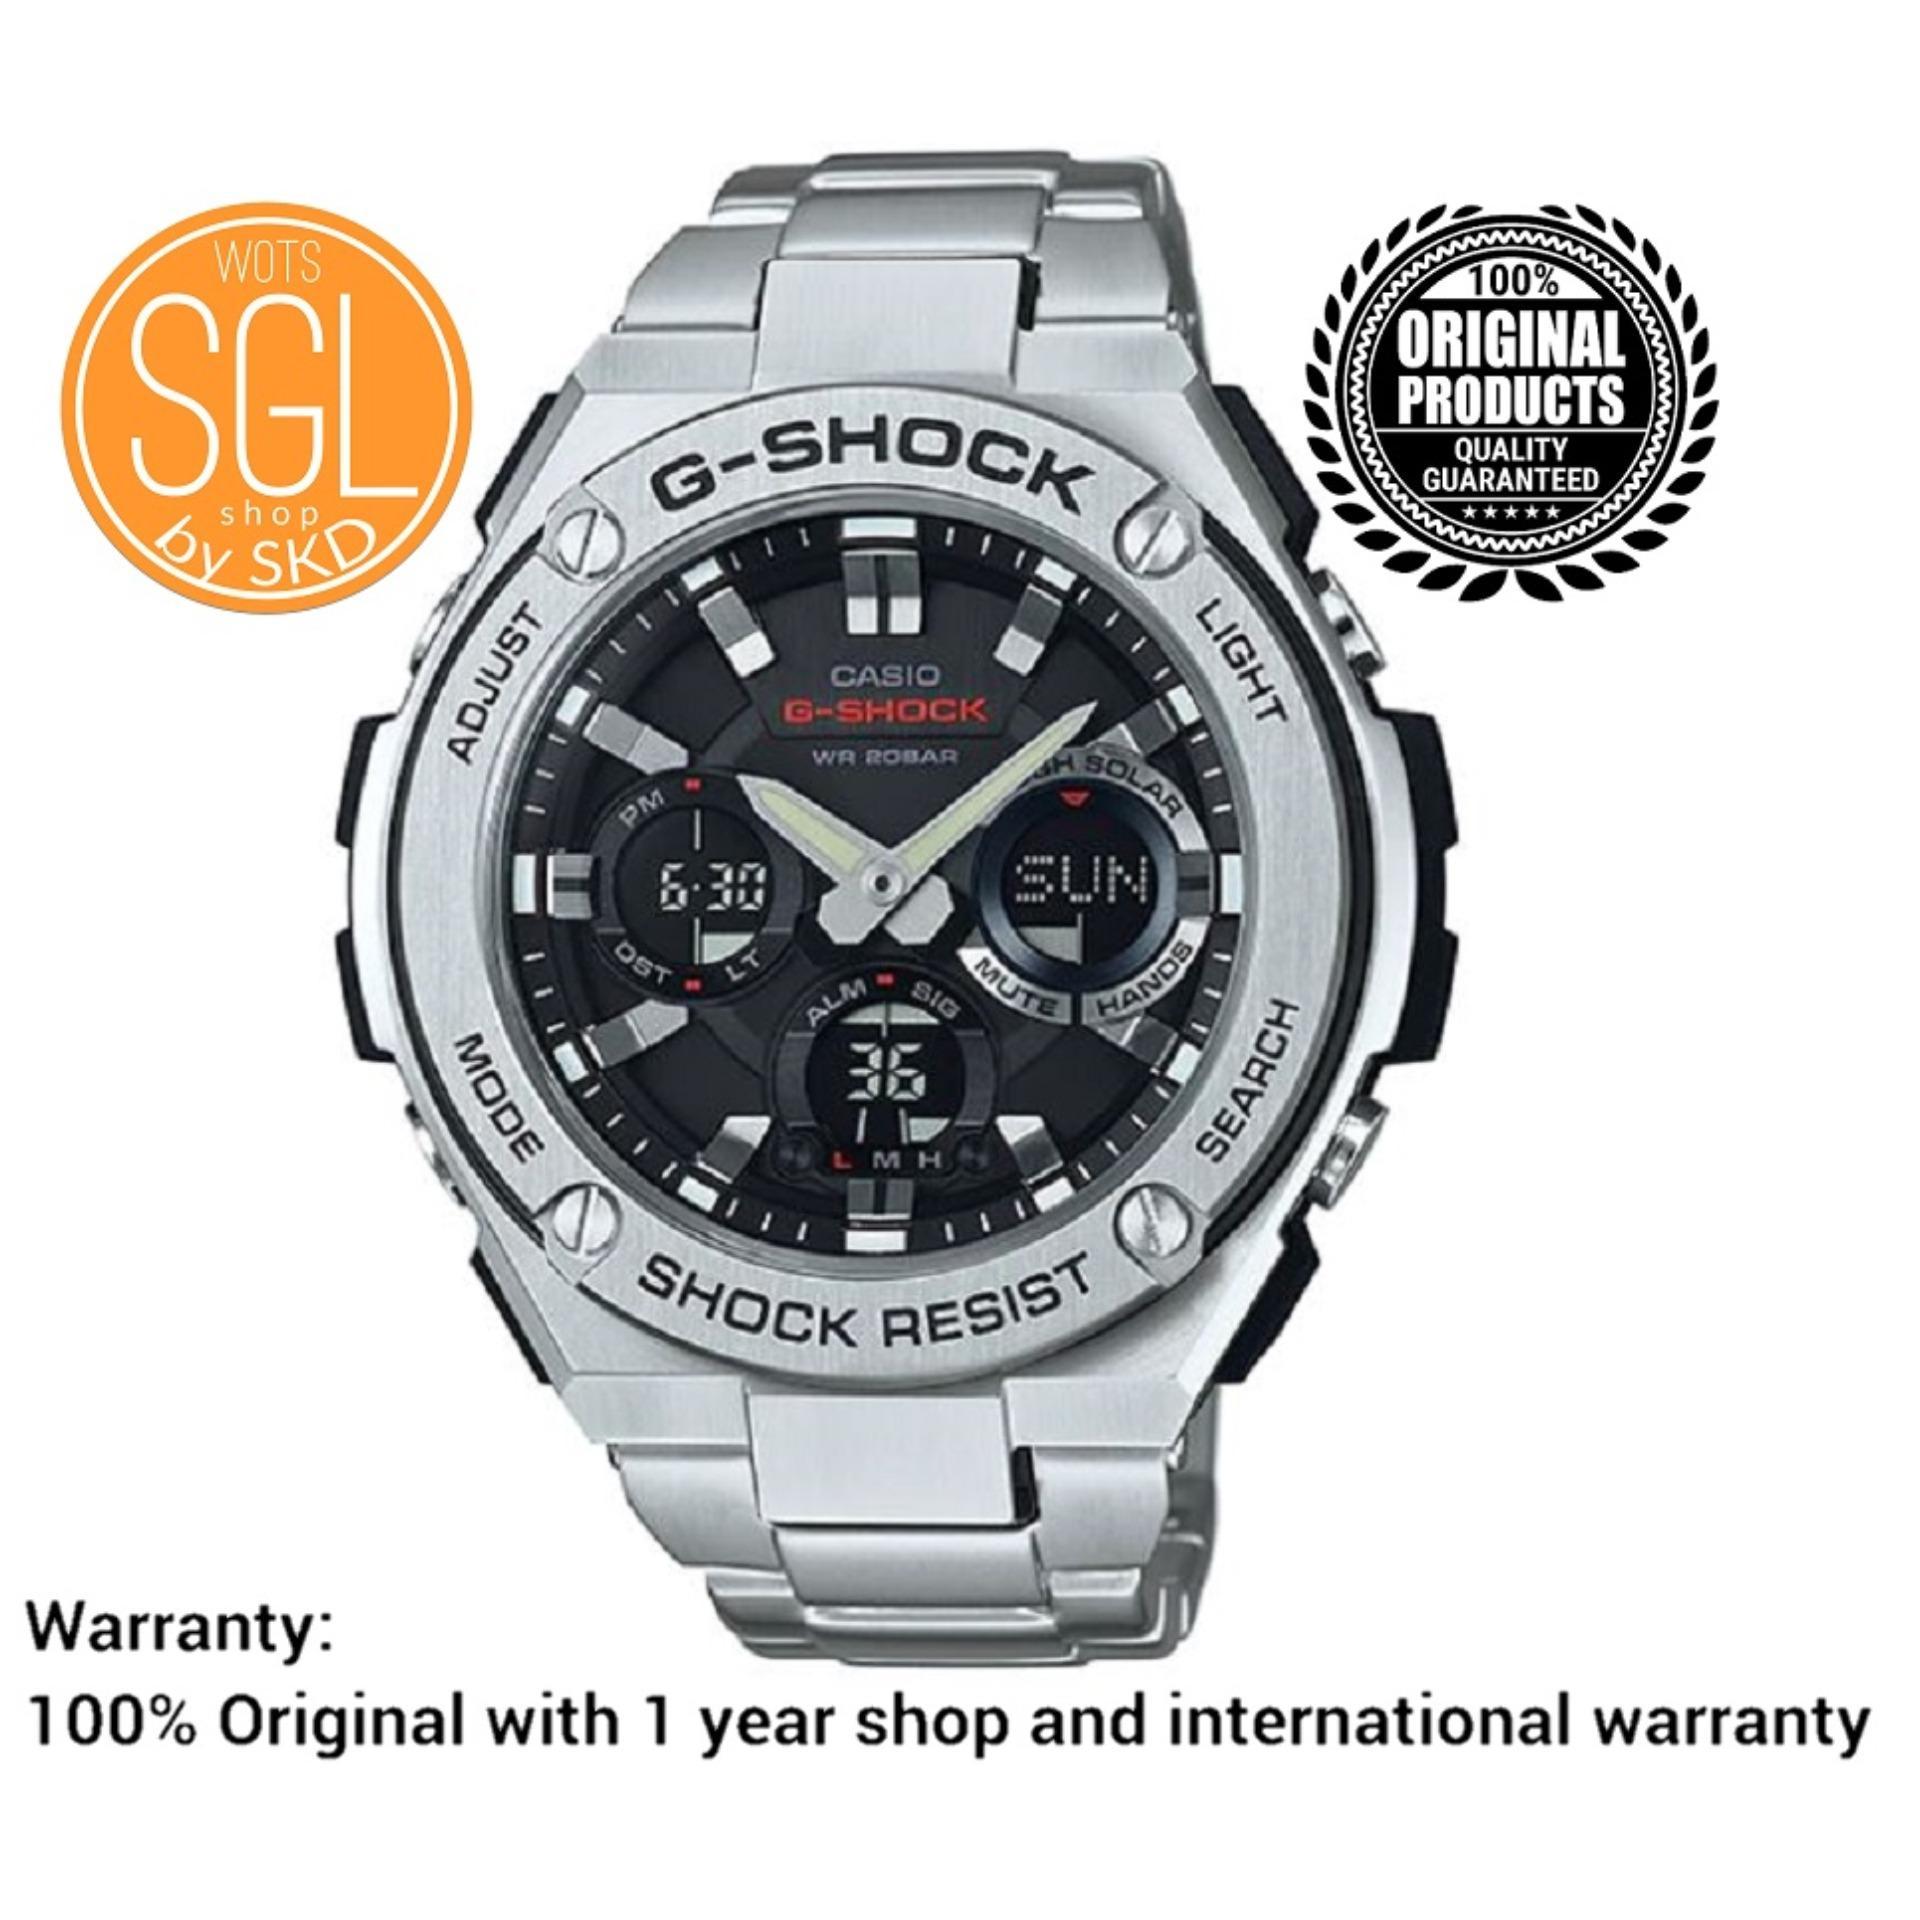 Casio G Shock G Steel Solar Powered Silver Watch Gsts110d 1 Sgl Wots